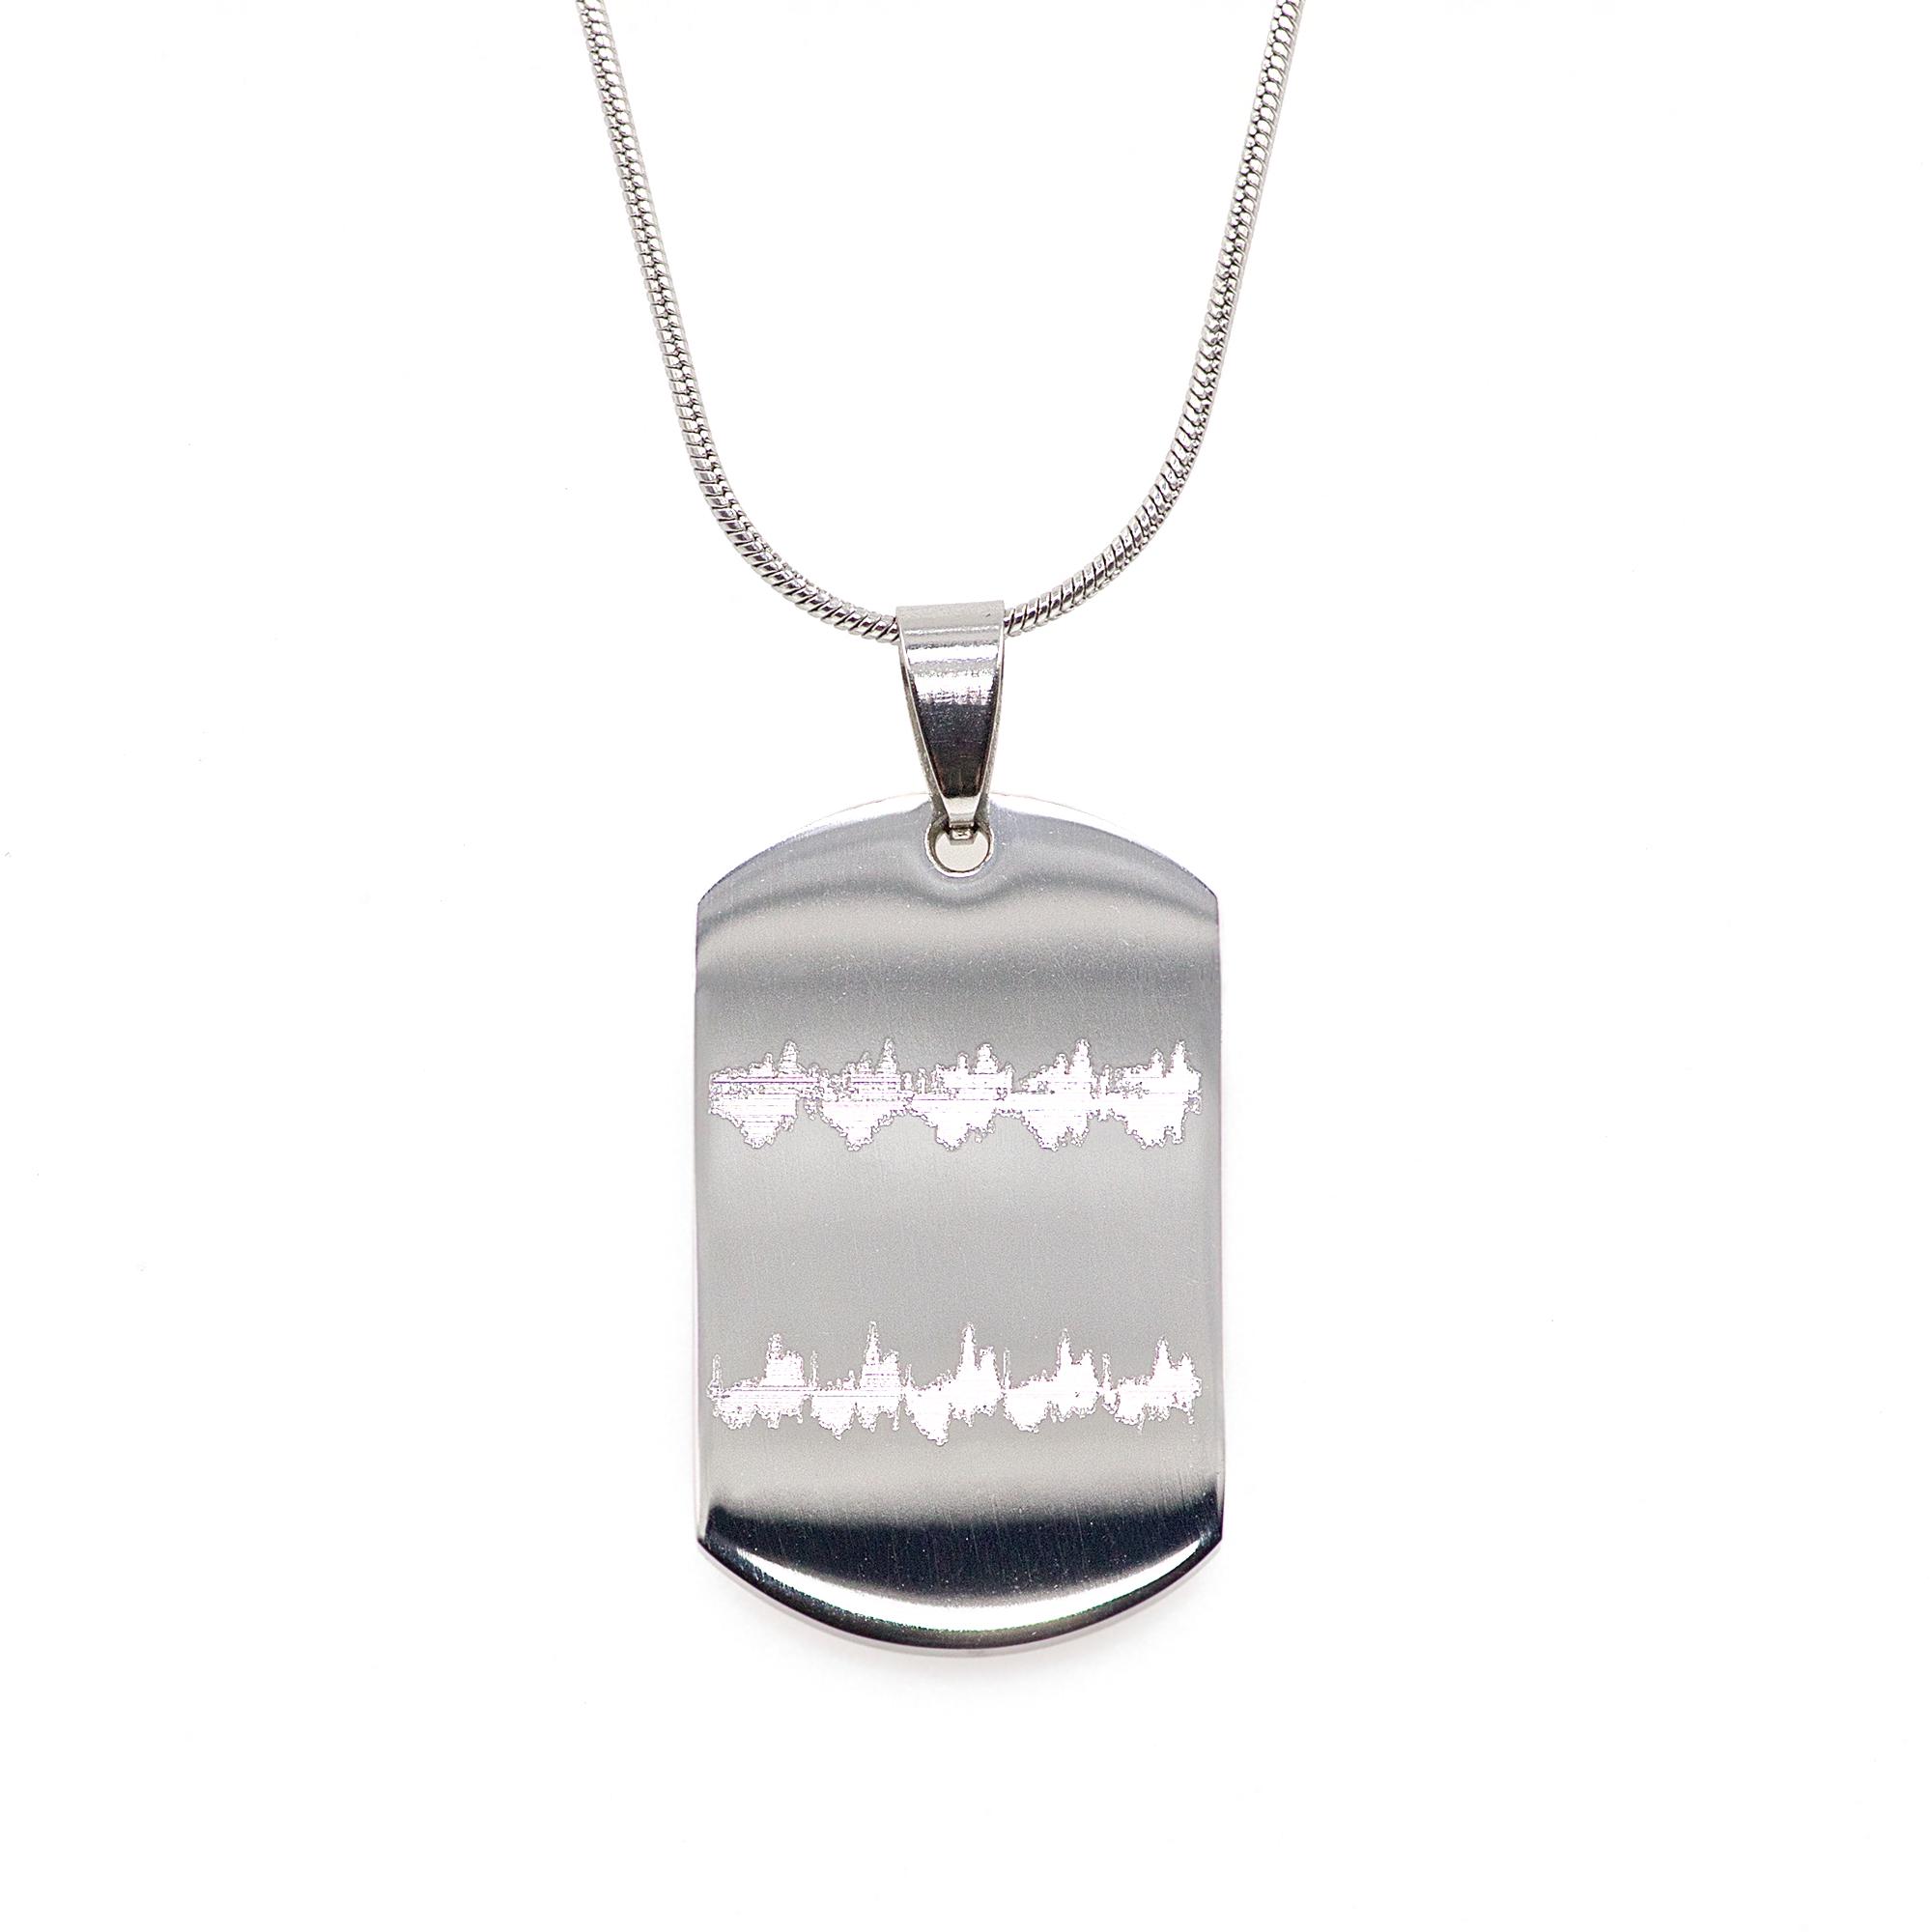 Mini Heartbeat Dog Tag Necklace